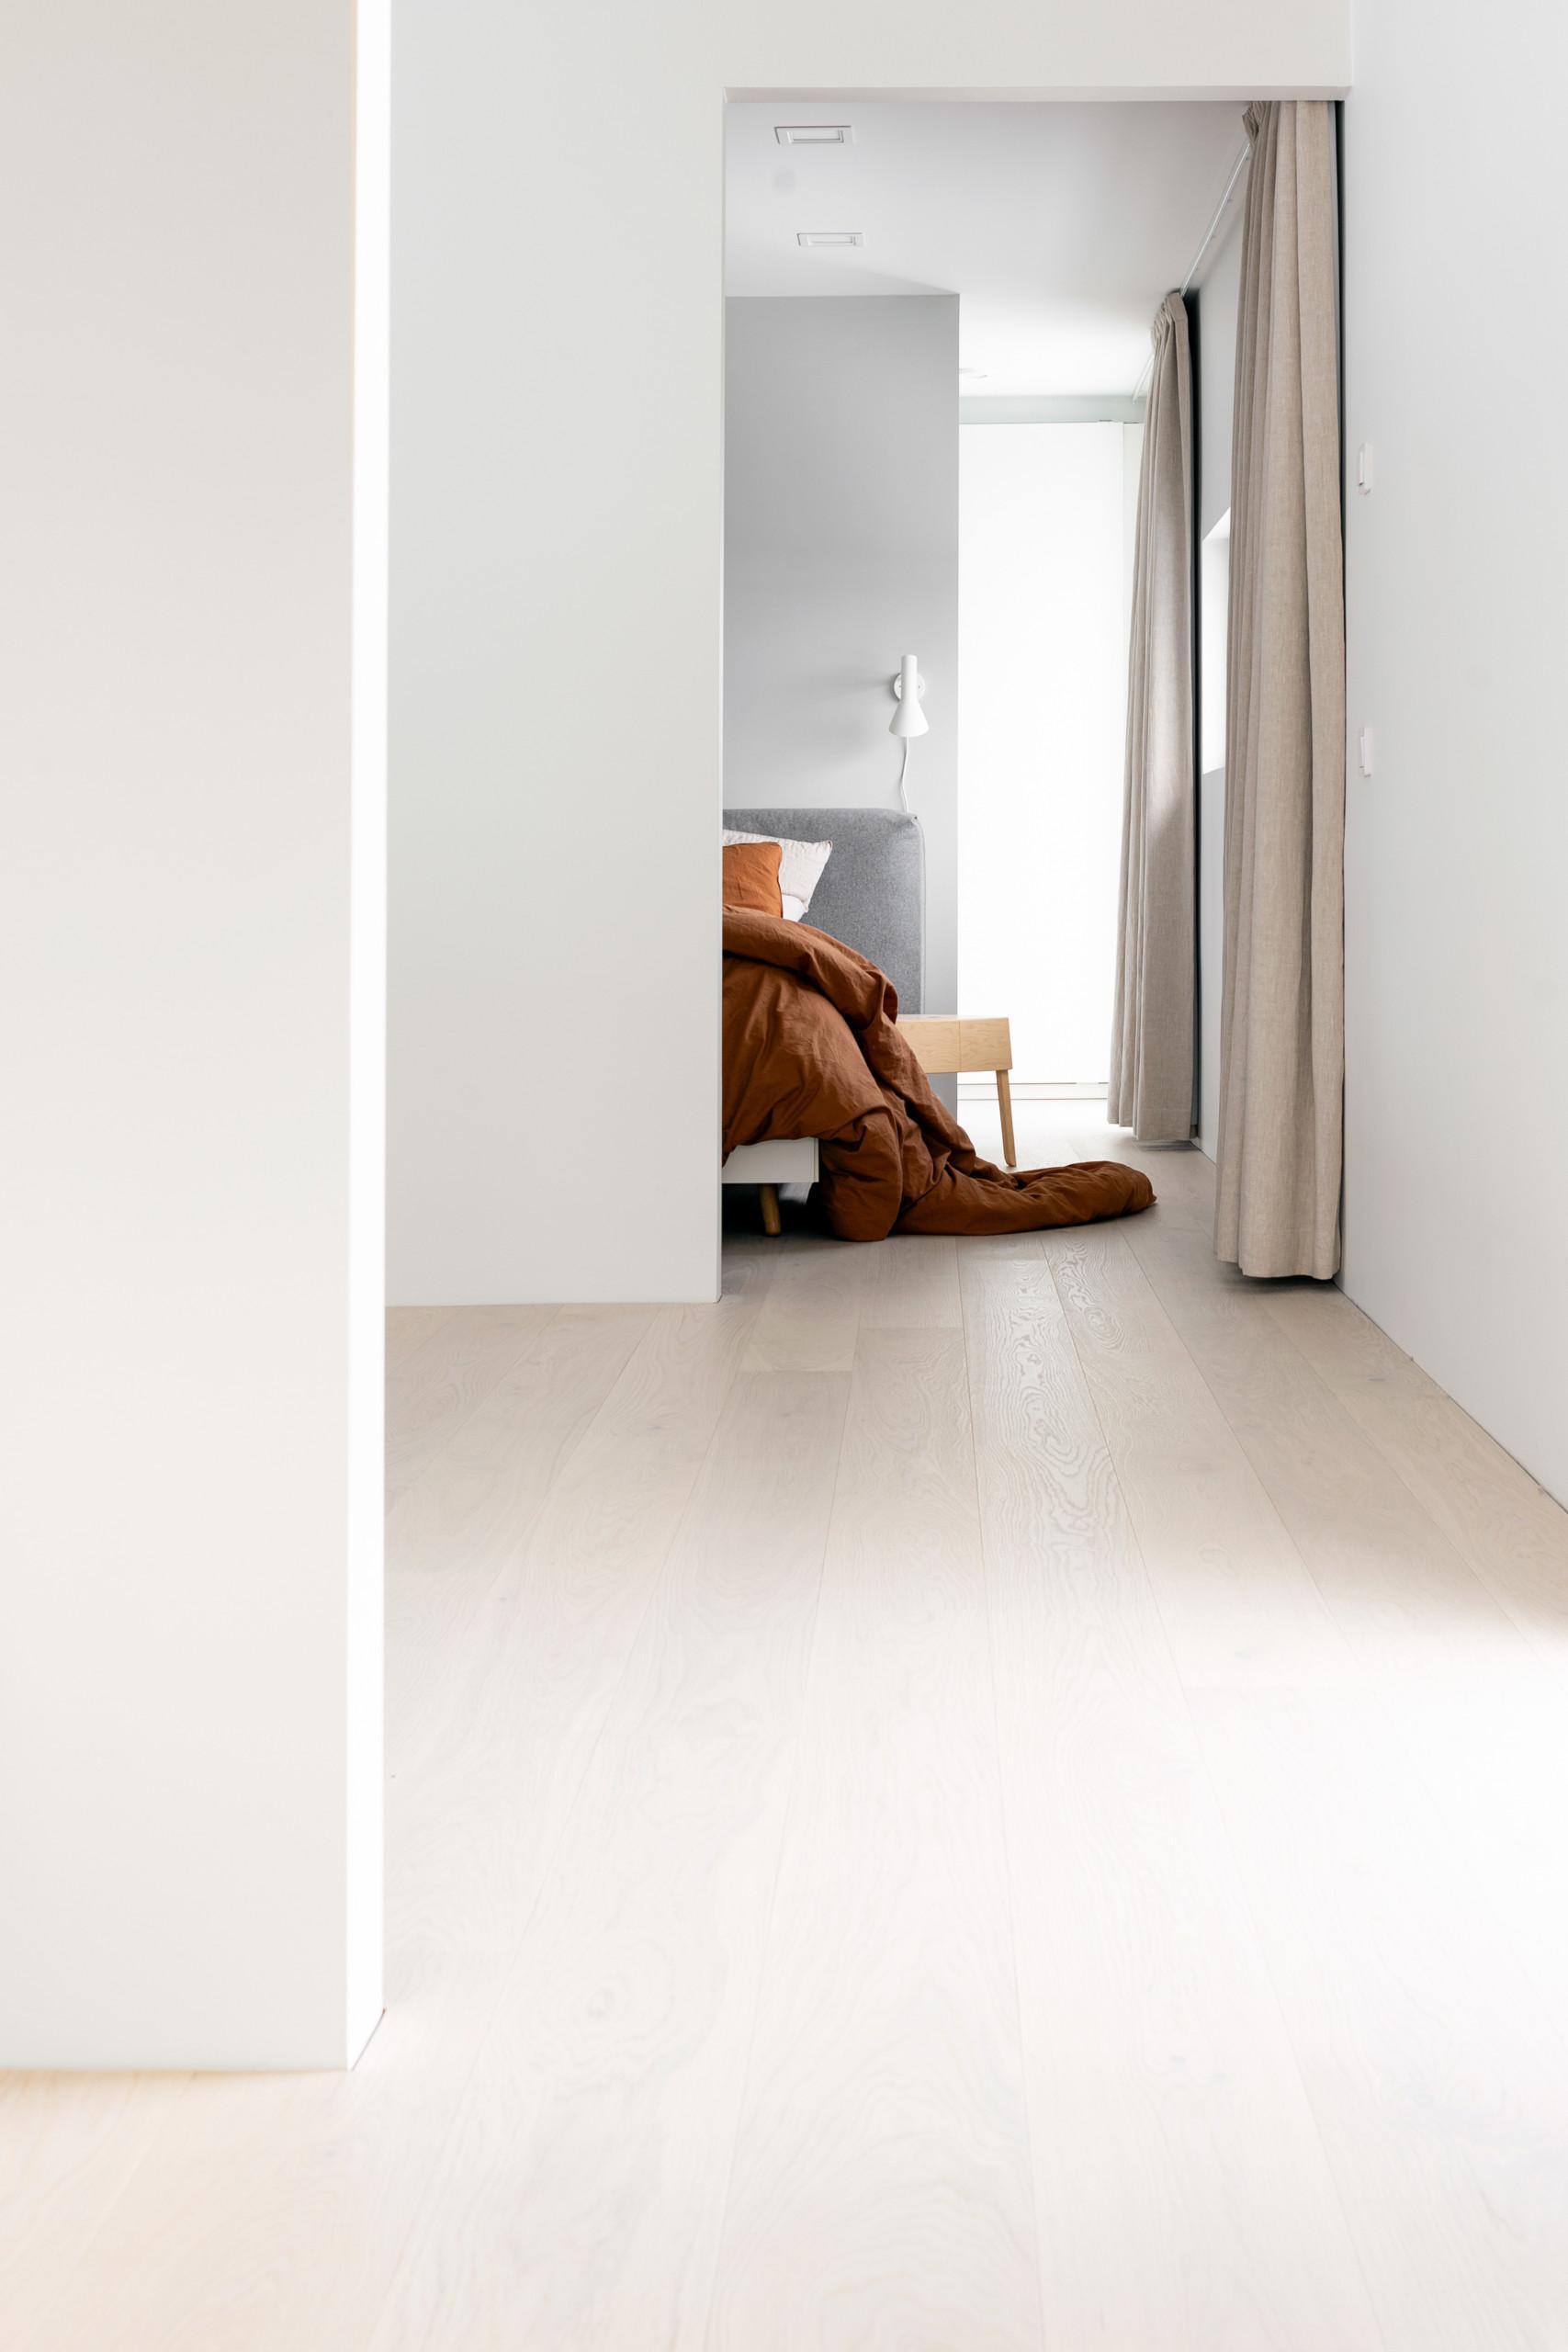 Timberwise parketti puulattia wooden floor parquet Tammi Oak White Cream